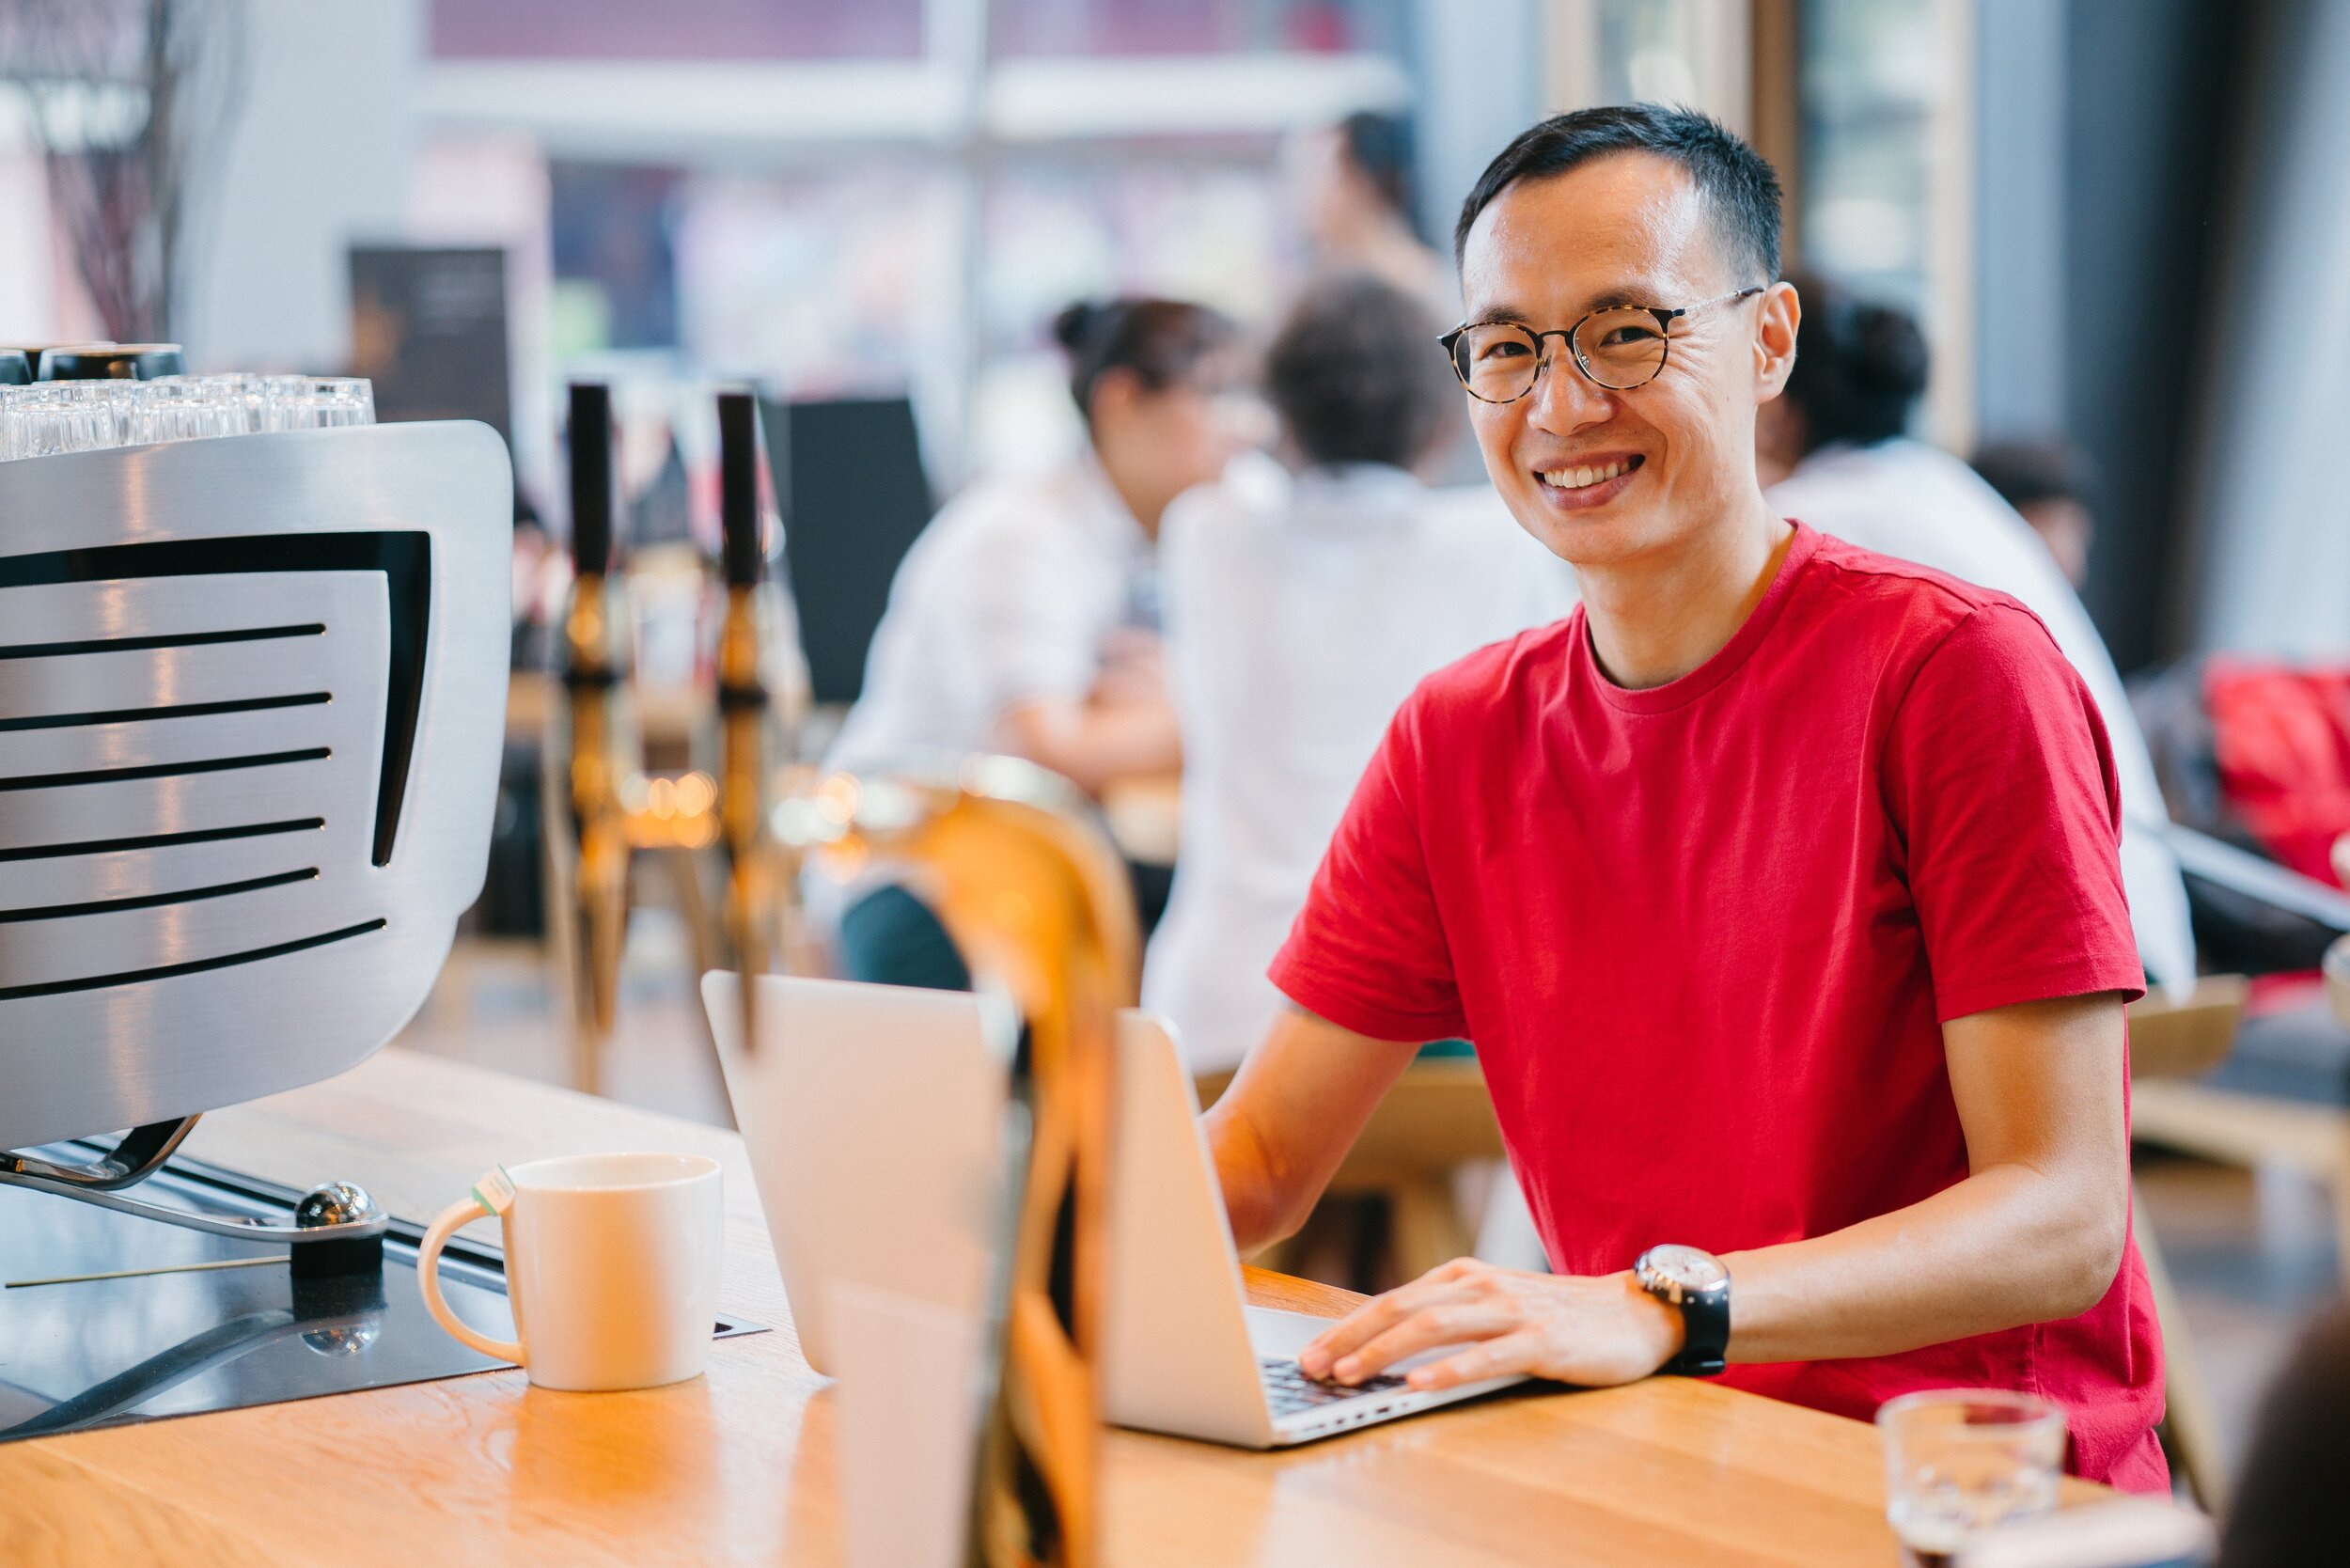 nashville-tn-managed-service-provider-affinity-technology-partners-freelance-worker.jpg